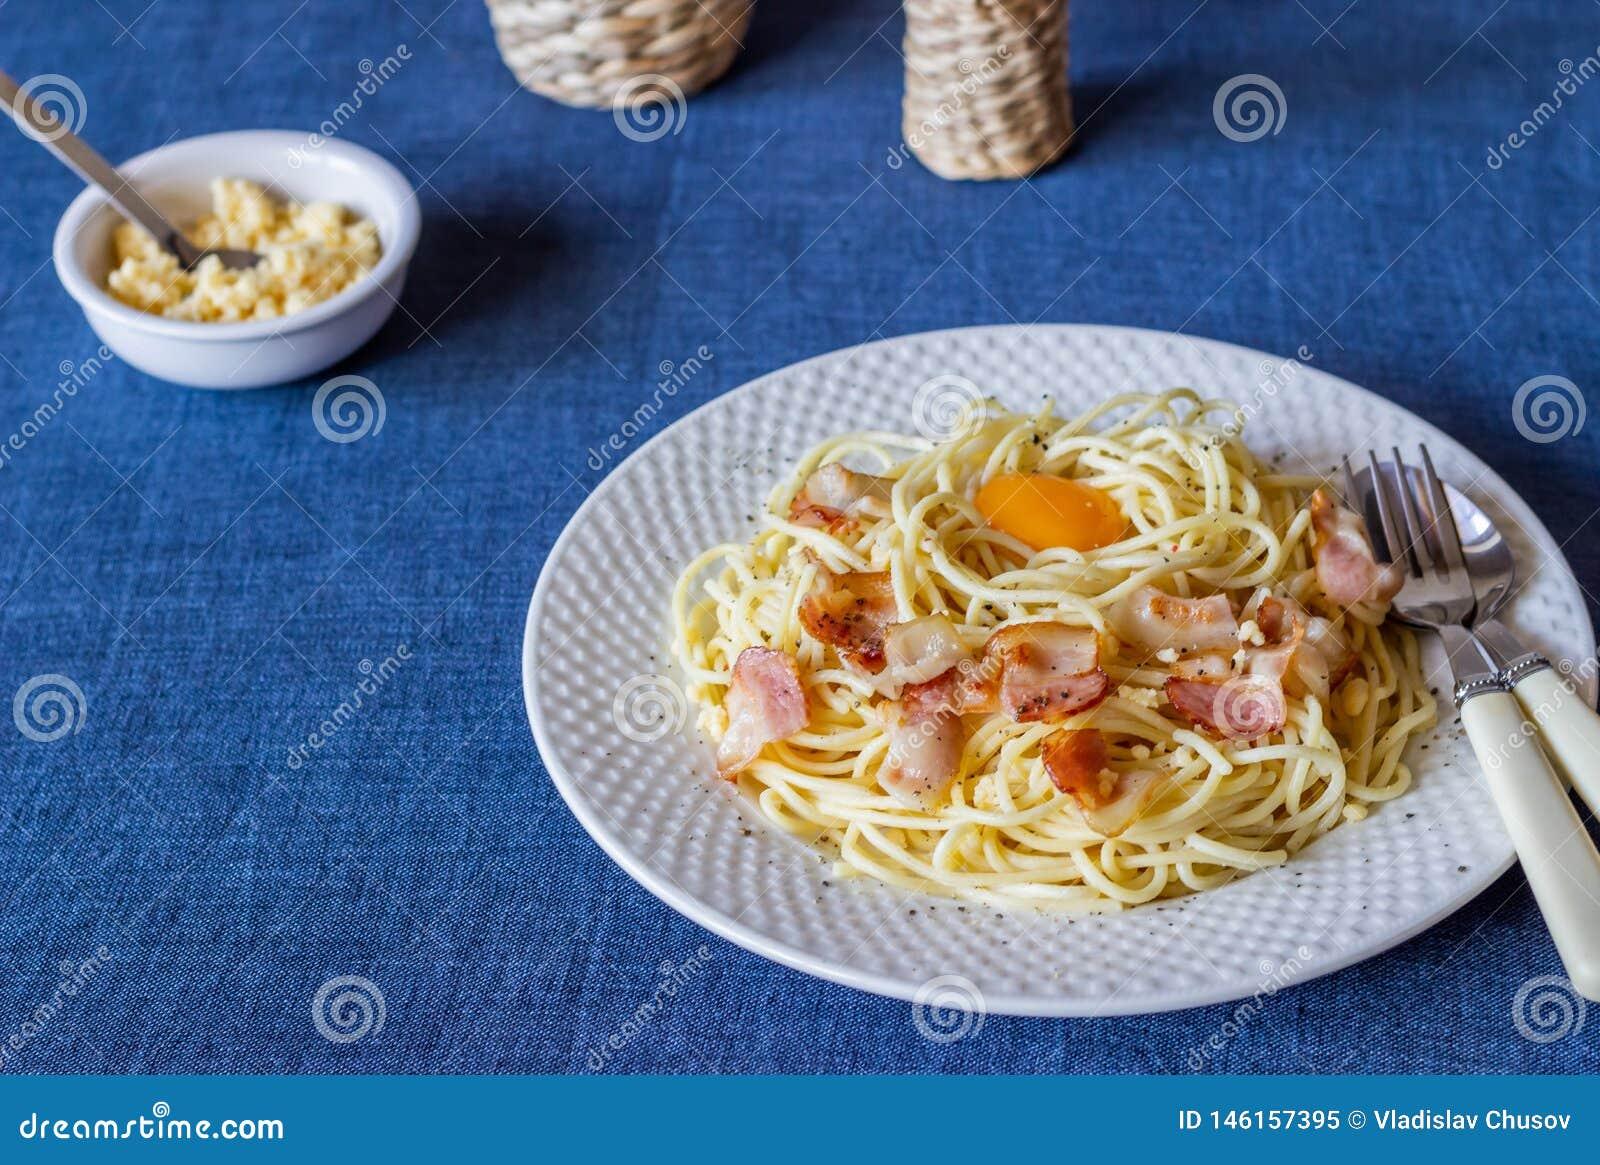 Pasta Carbonara on a blue background. Italian food